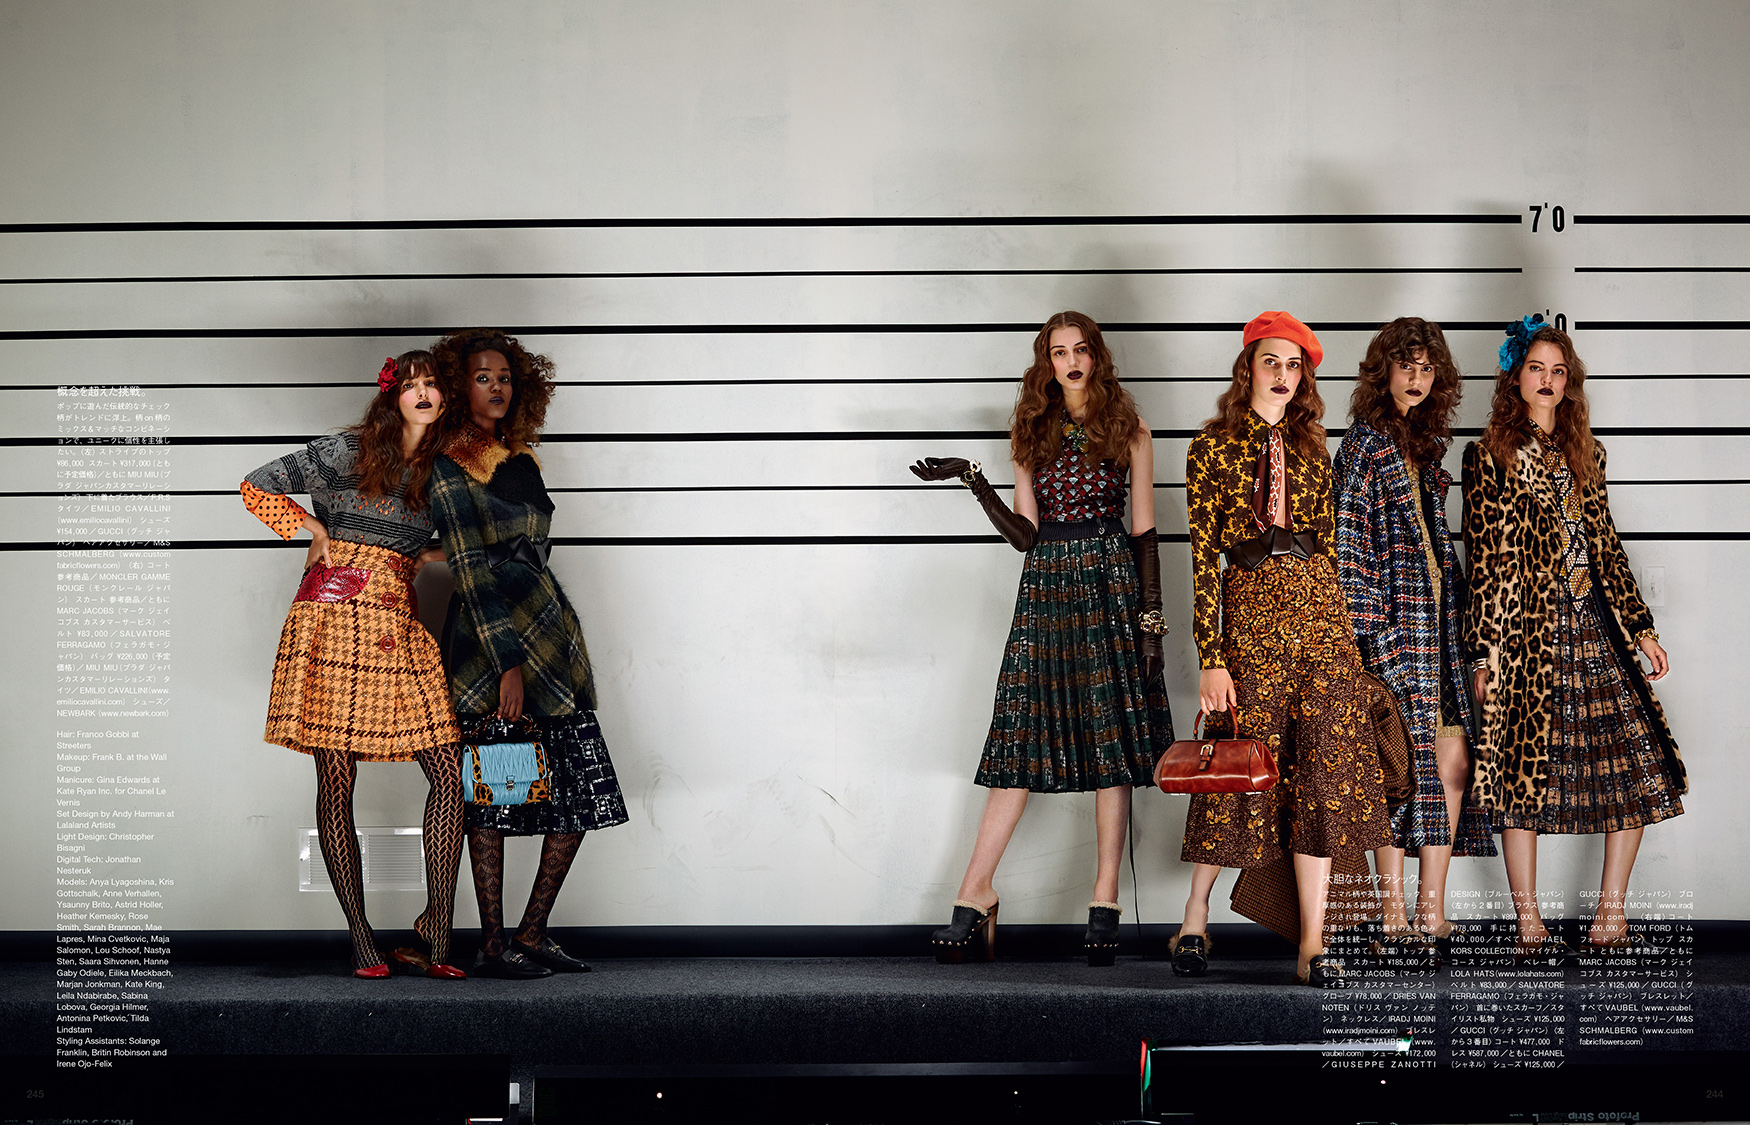 Giovanna-Battaglia-Vogue-Japan-November-2015-Fashion-Line-Up-4-0.jpg